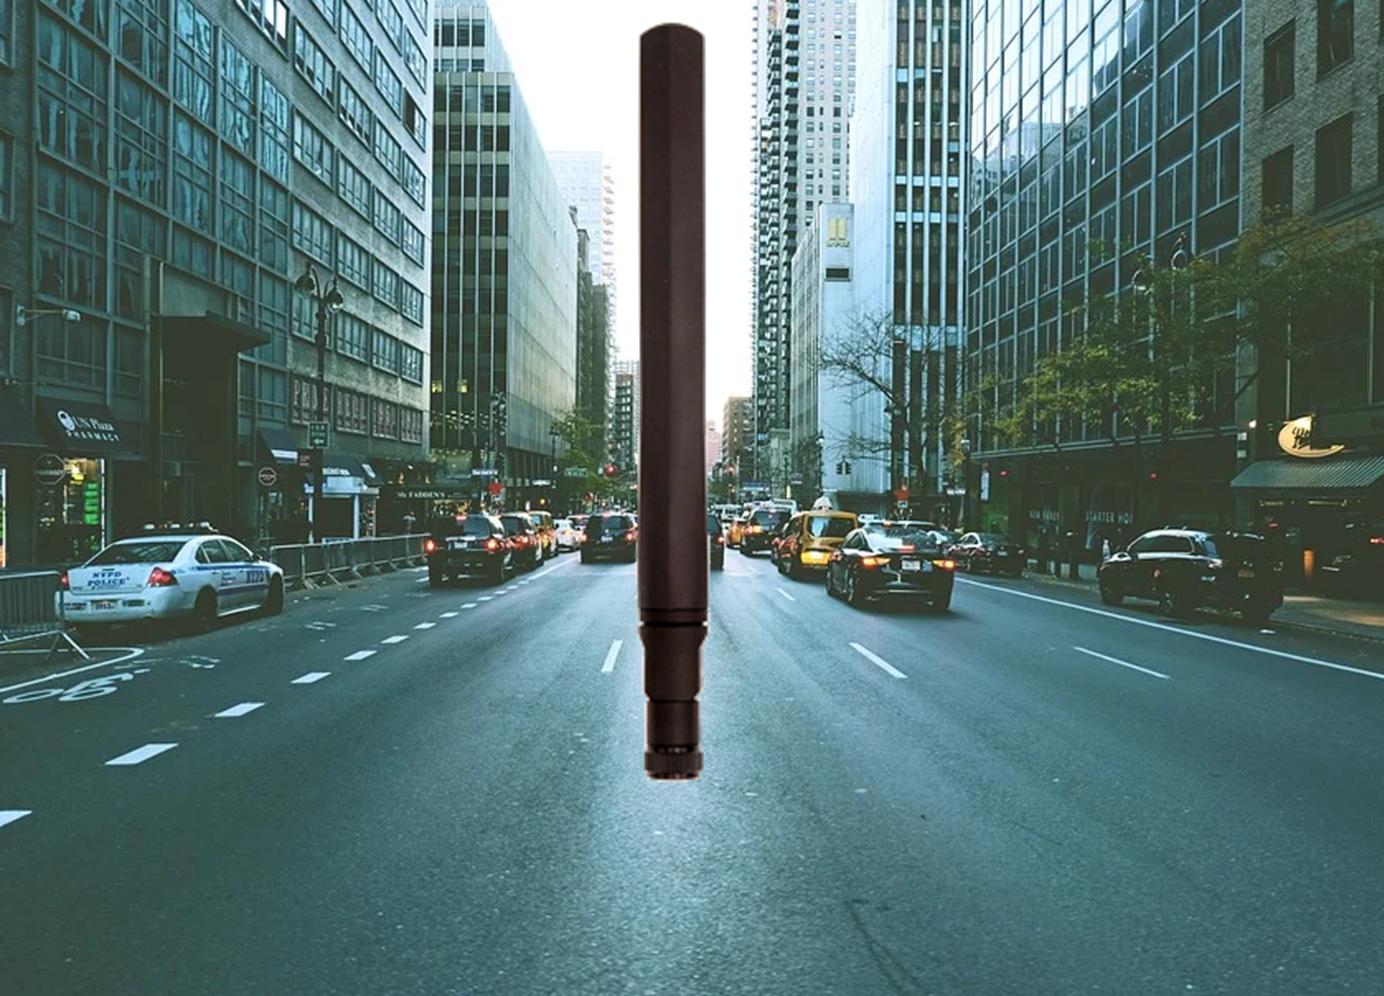 tekmodul mit neuen high-performance 5G-Antennen